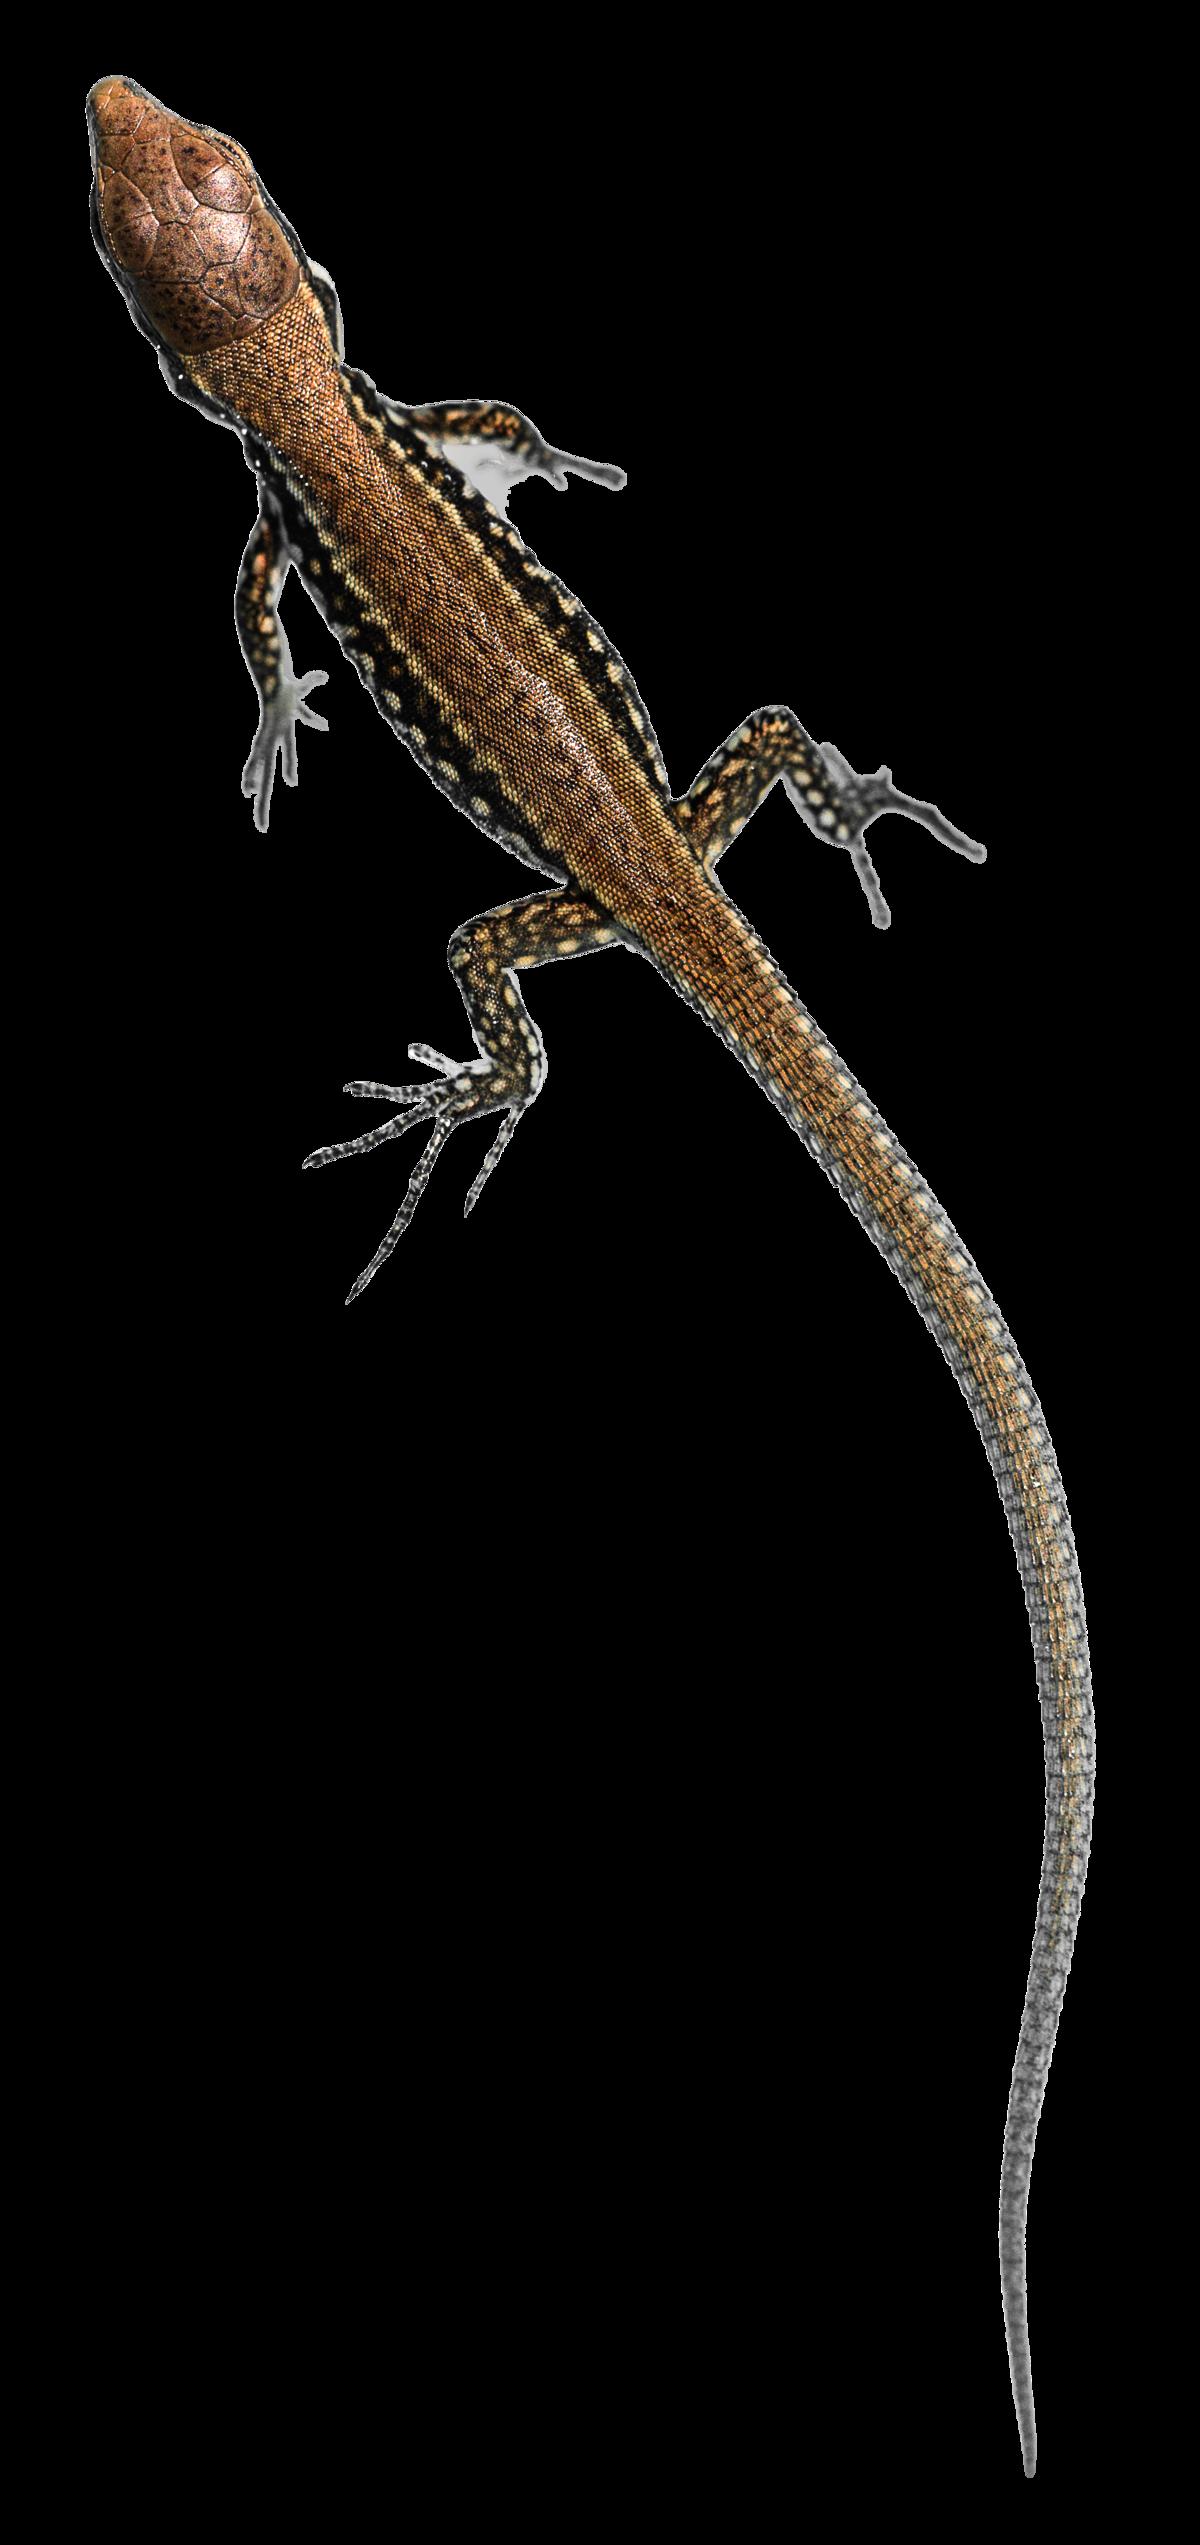 House Lizard PNG - 45577